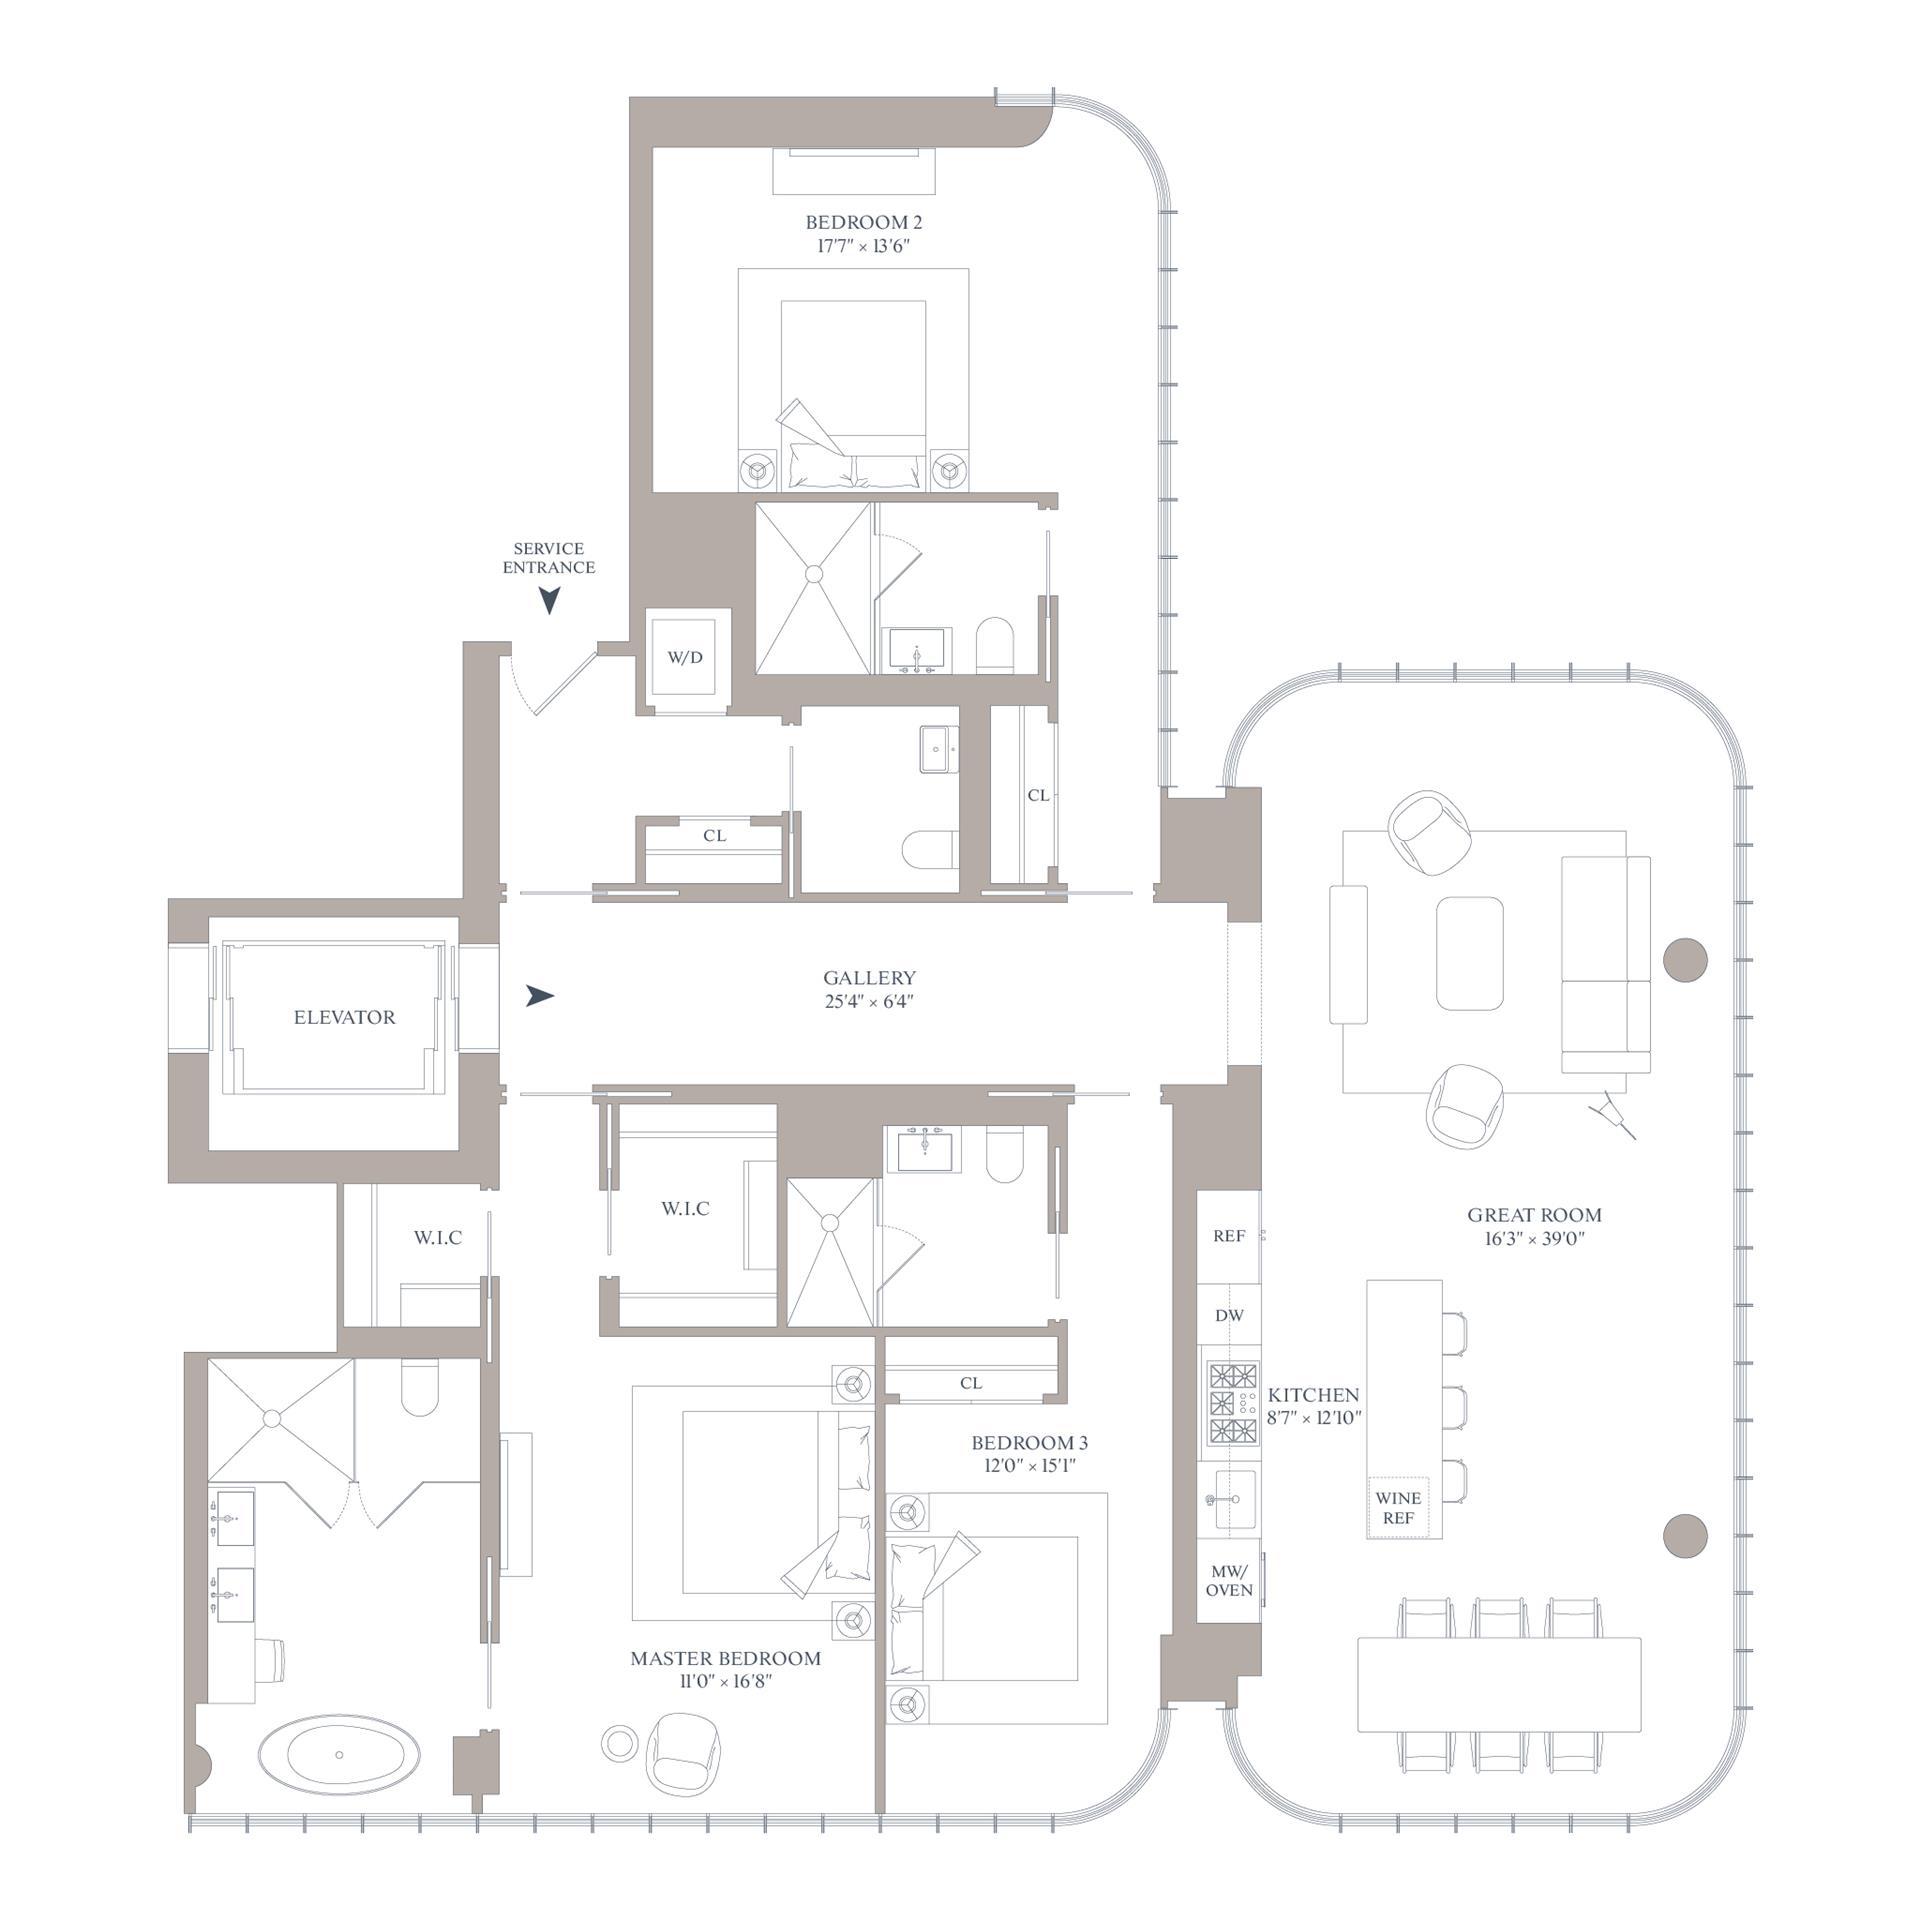 Floor plan of 565 Broome St, S18B - SoHo - Nolita, New York